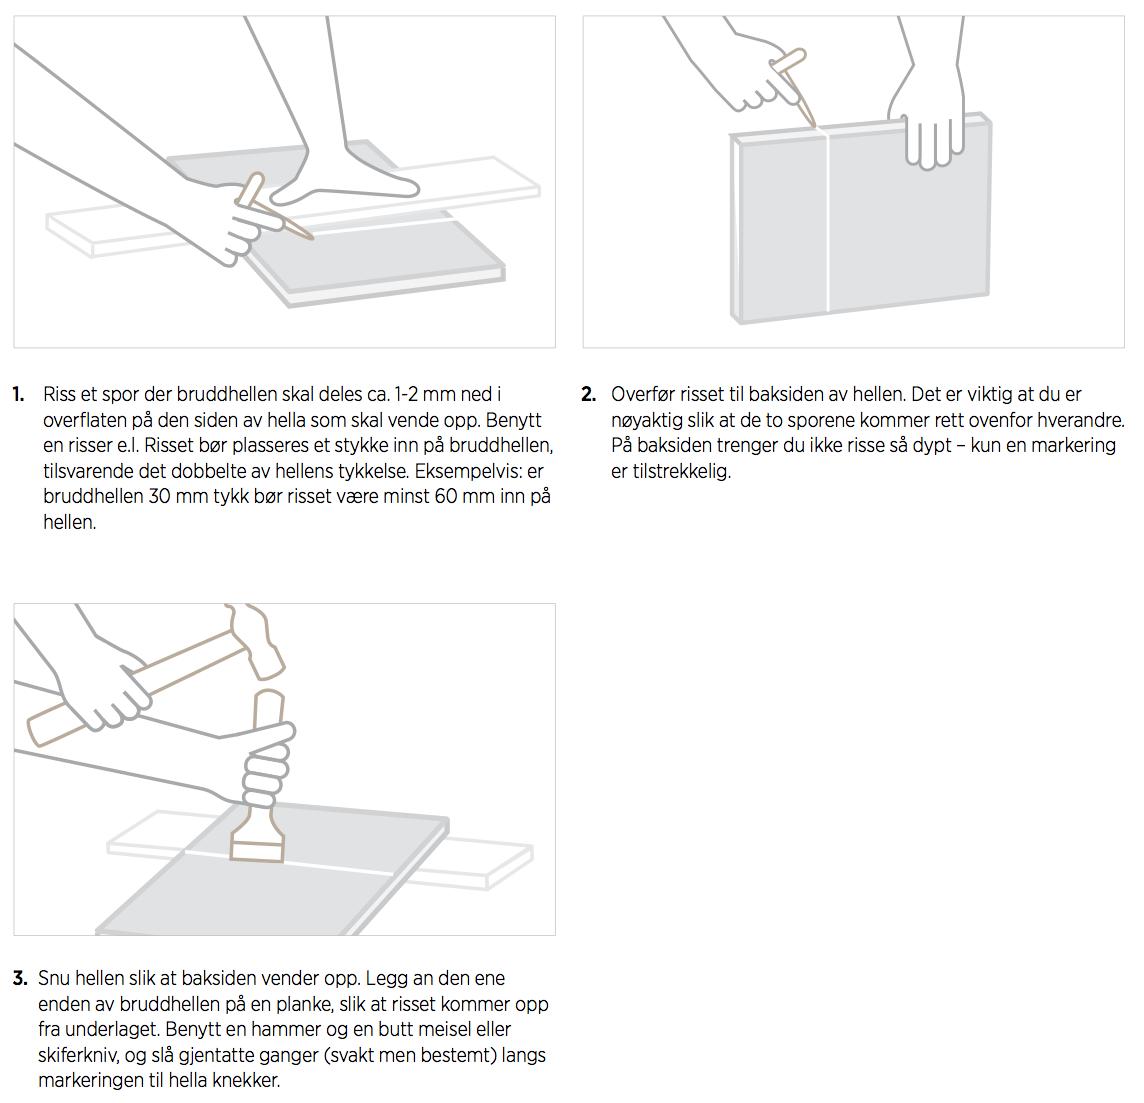 Monteringsveiledning bruddheller mørtel - tilpasning